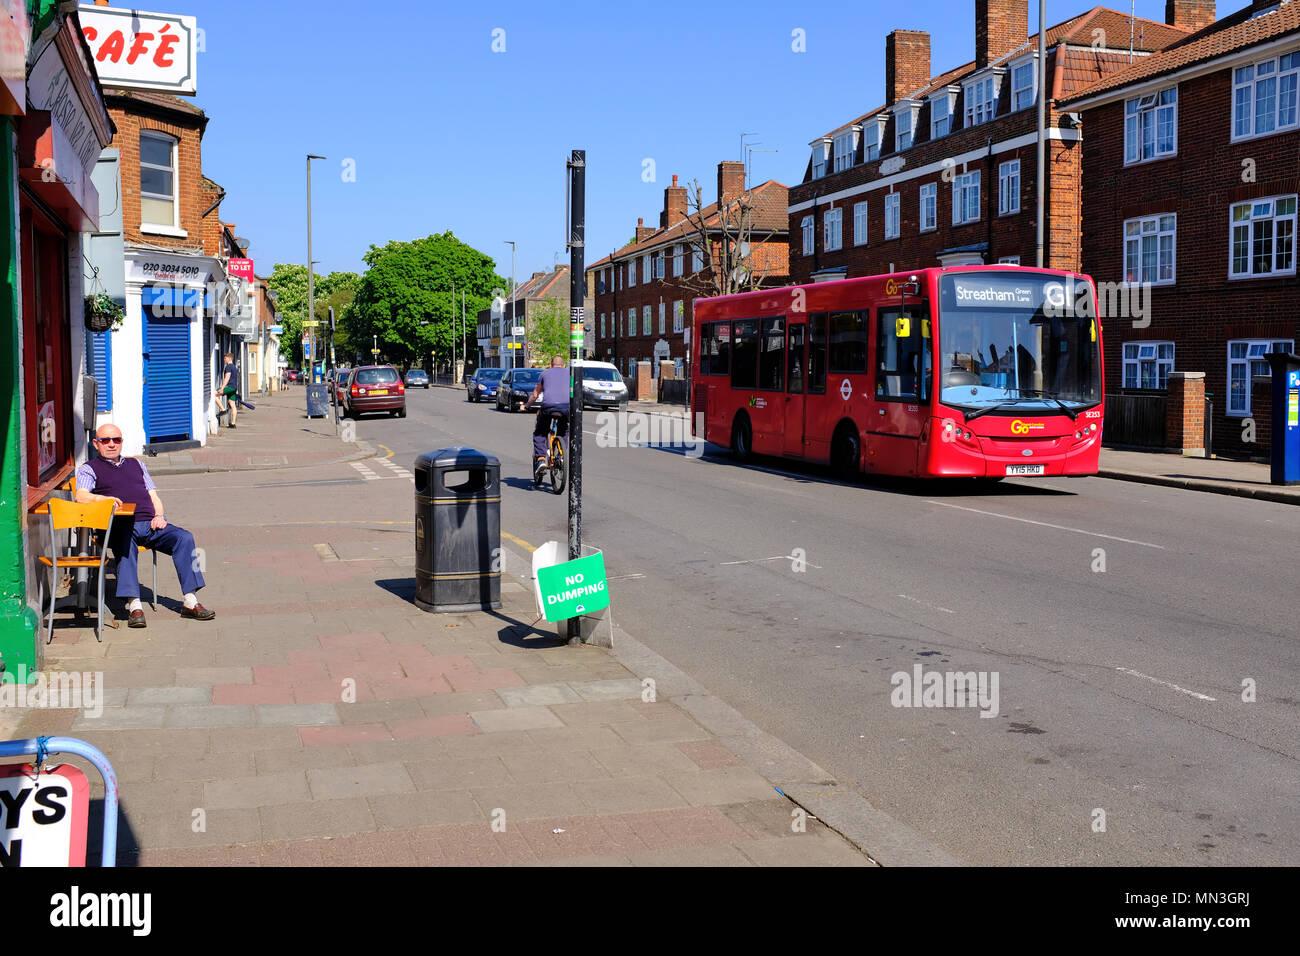 Red bus on Garratt Lane Tooting London SW17 - Stock Image